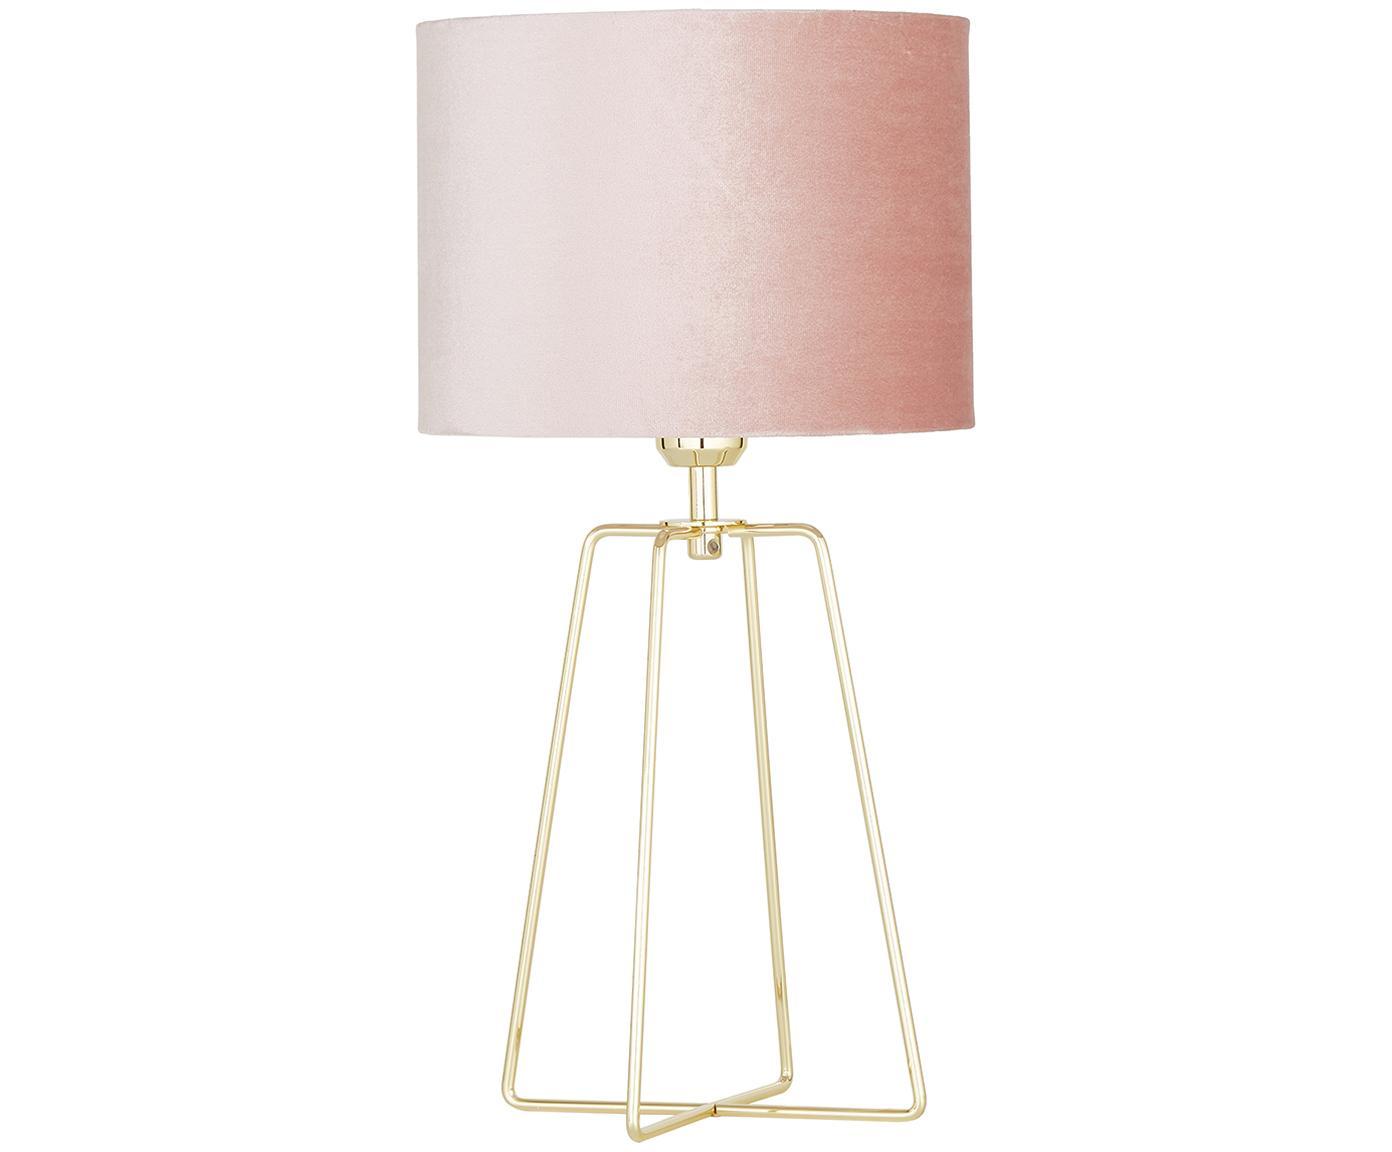 Lámpara de mesa Karolina, Pantalla: terciopelo, Cable: plástico, Rosa palo, latón brillante, Ø 25 x Al 49 cm